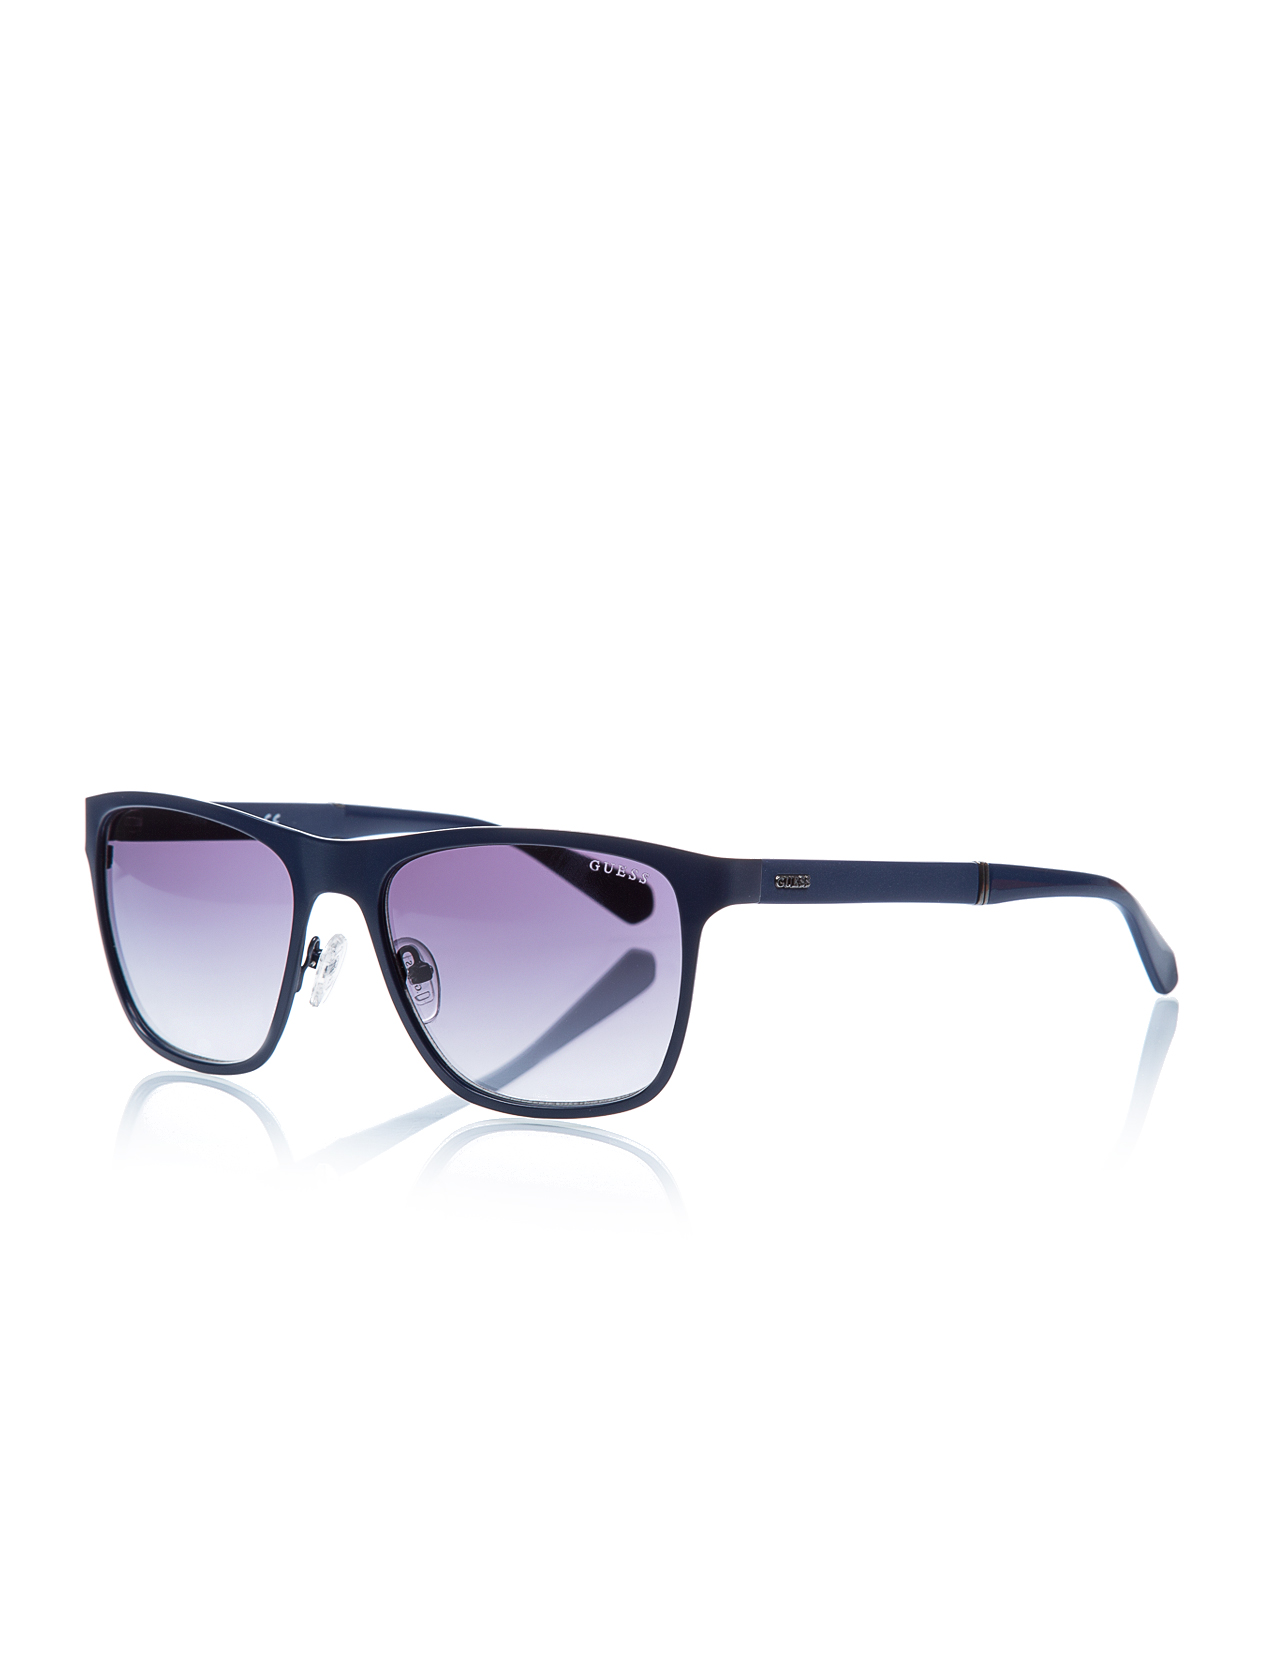 Men's sunglasses gu 6891 91x metal navy blue organic square square 57-18-140 guess